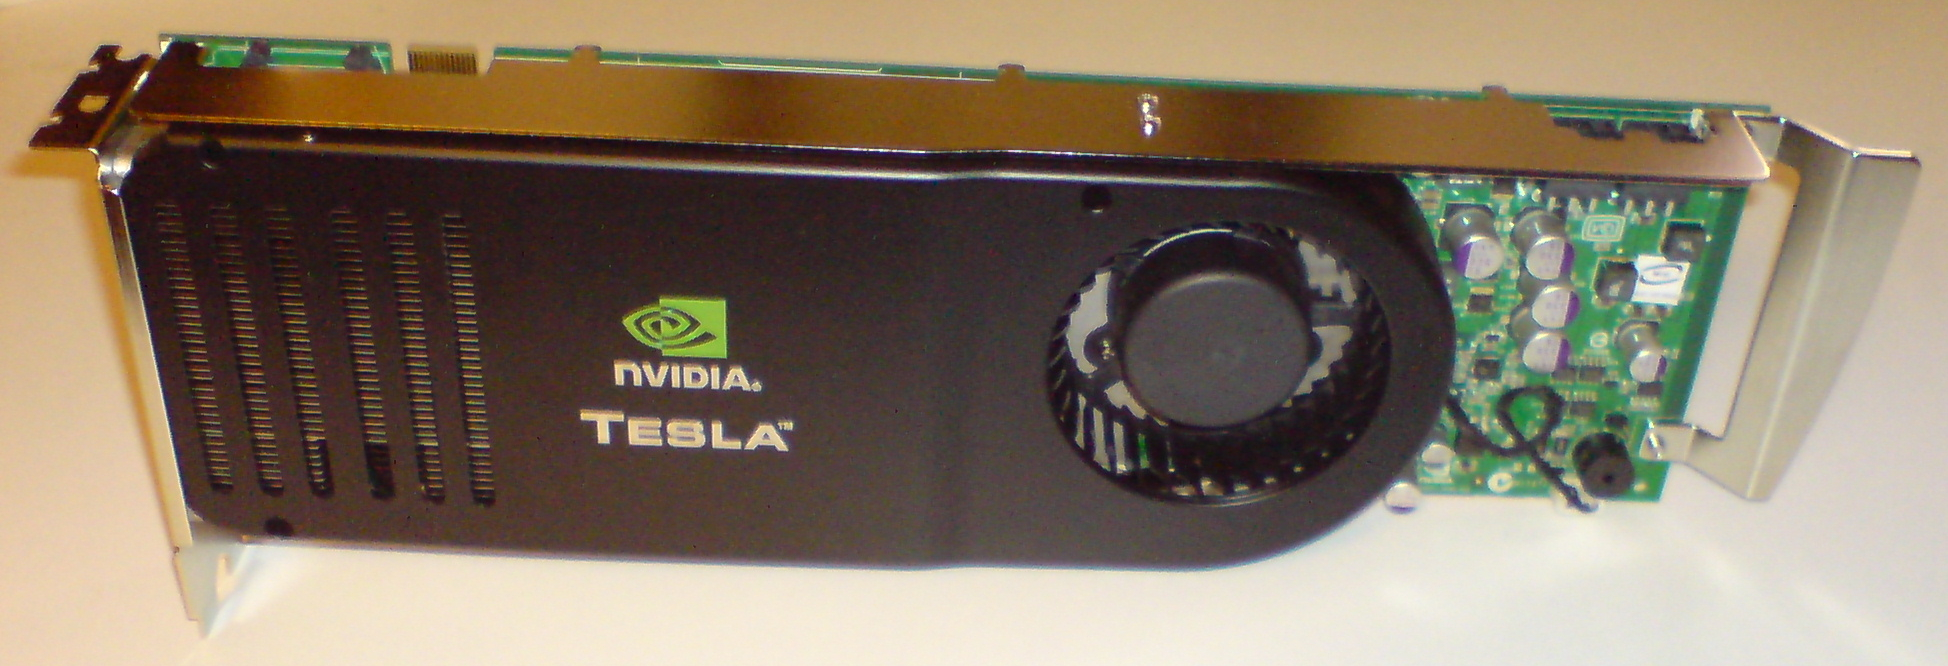 Tesla - 產品概述及技術簡介下載 - NVIDIA|NVIDIA